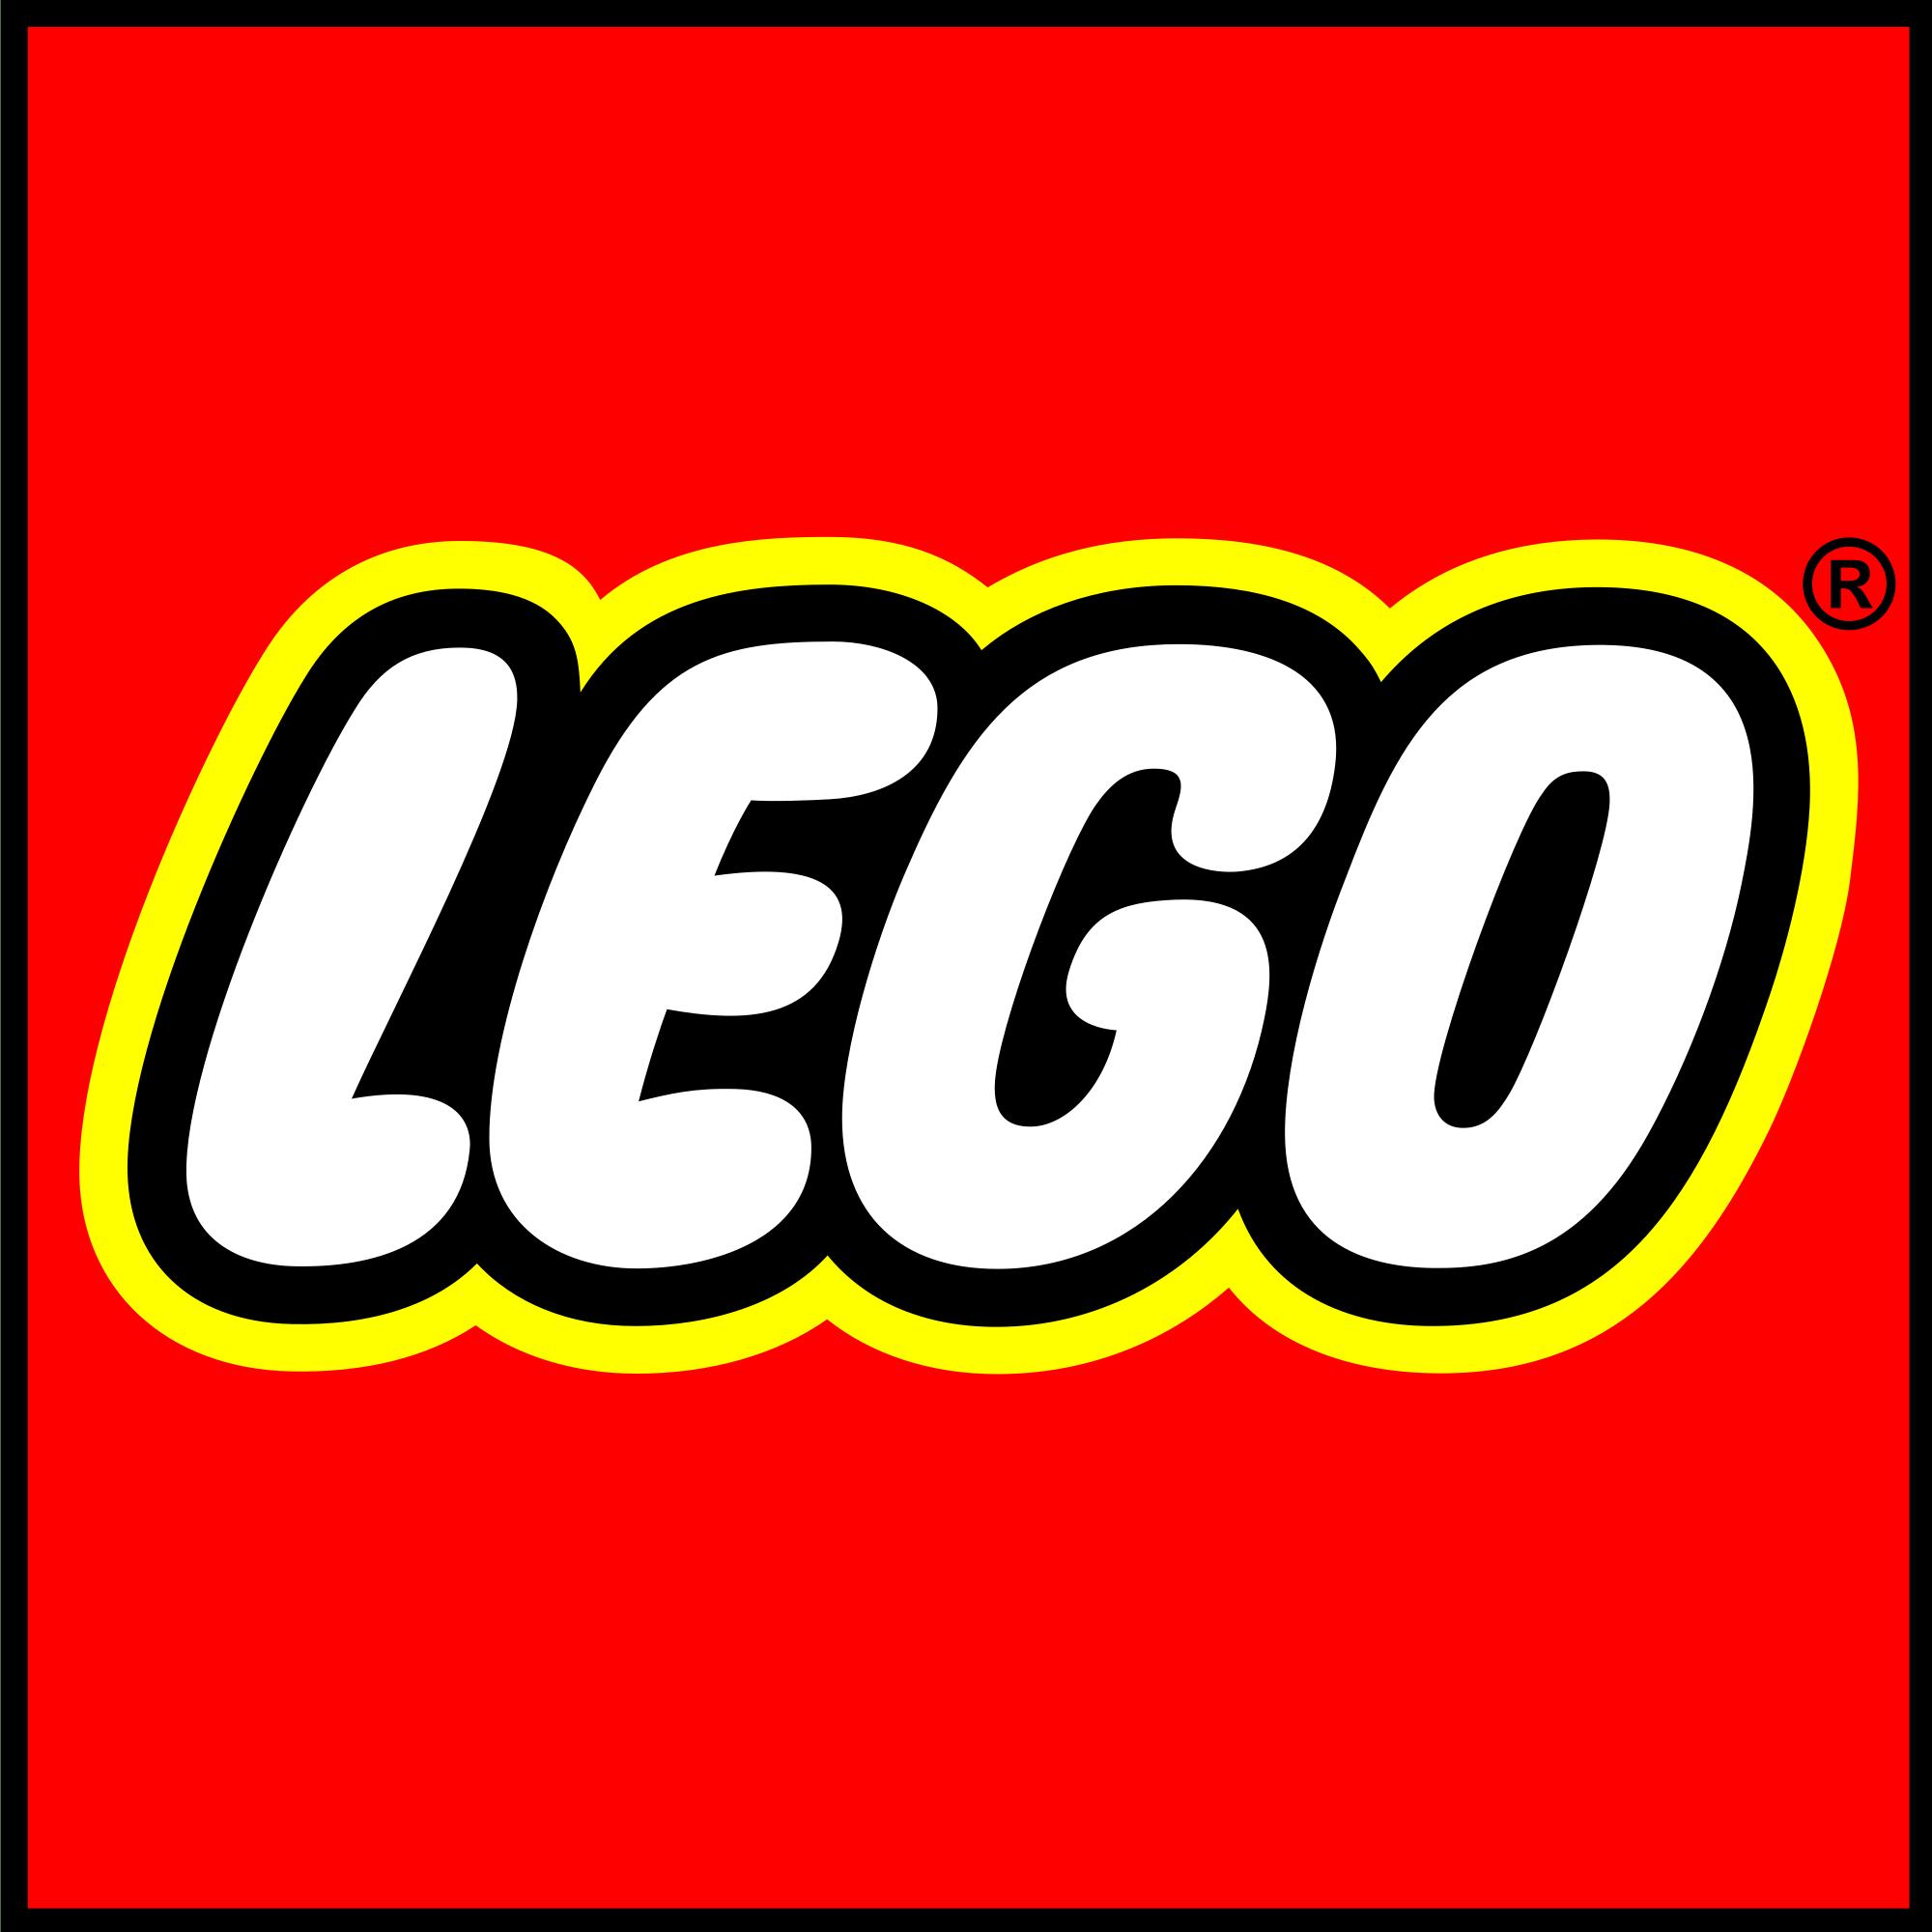 Wars De Calendrier Achat Star L'avent 75184 Lego® Vente 5RL34jAq